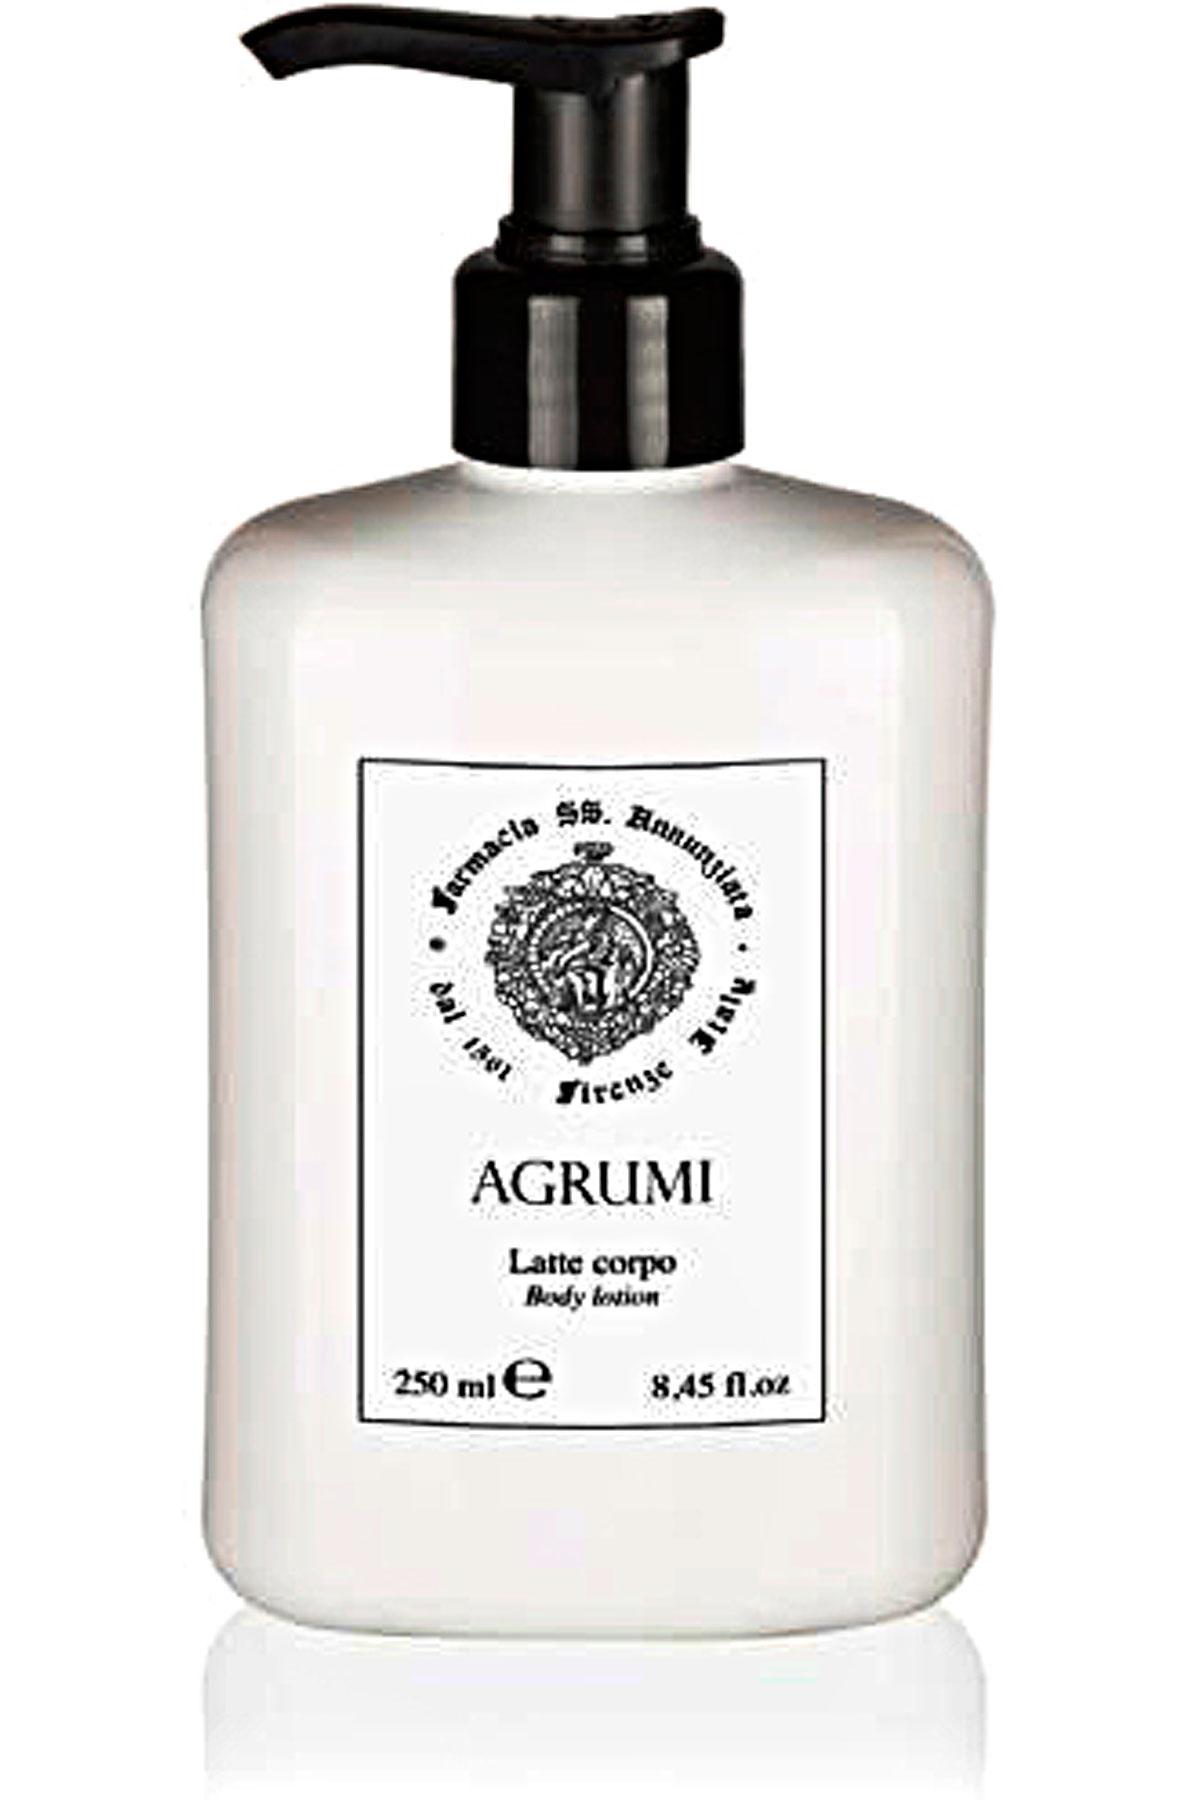 Farmacia Ss Annunziata 1561 Beauty for Men On Sale, Agrumi - Body Milk - 250 Ml, 2019, 250 ml